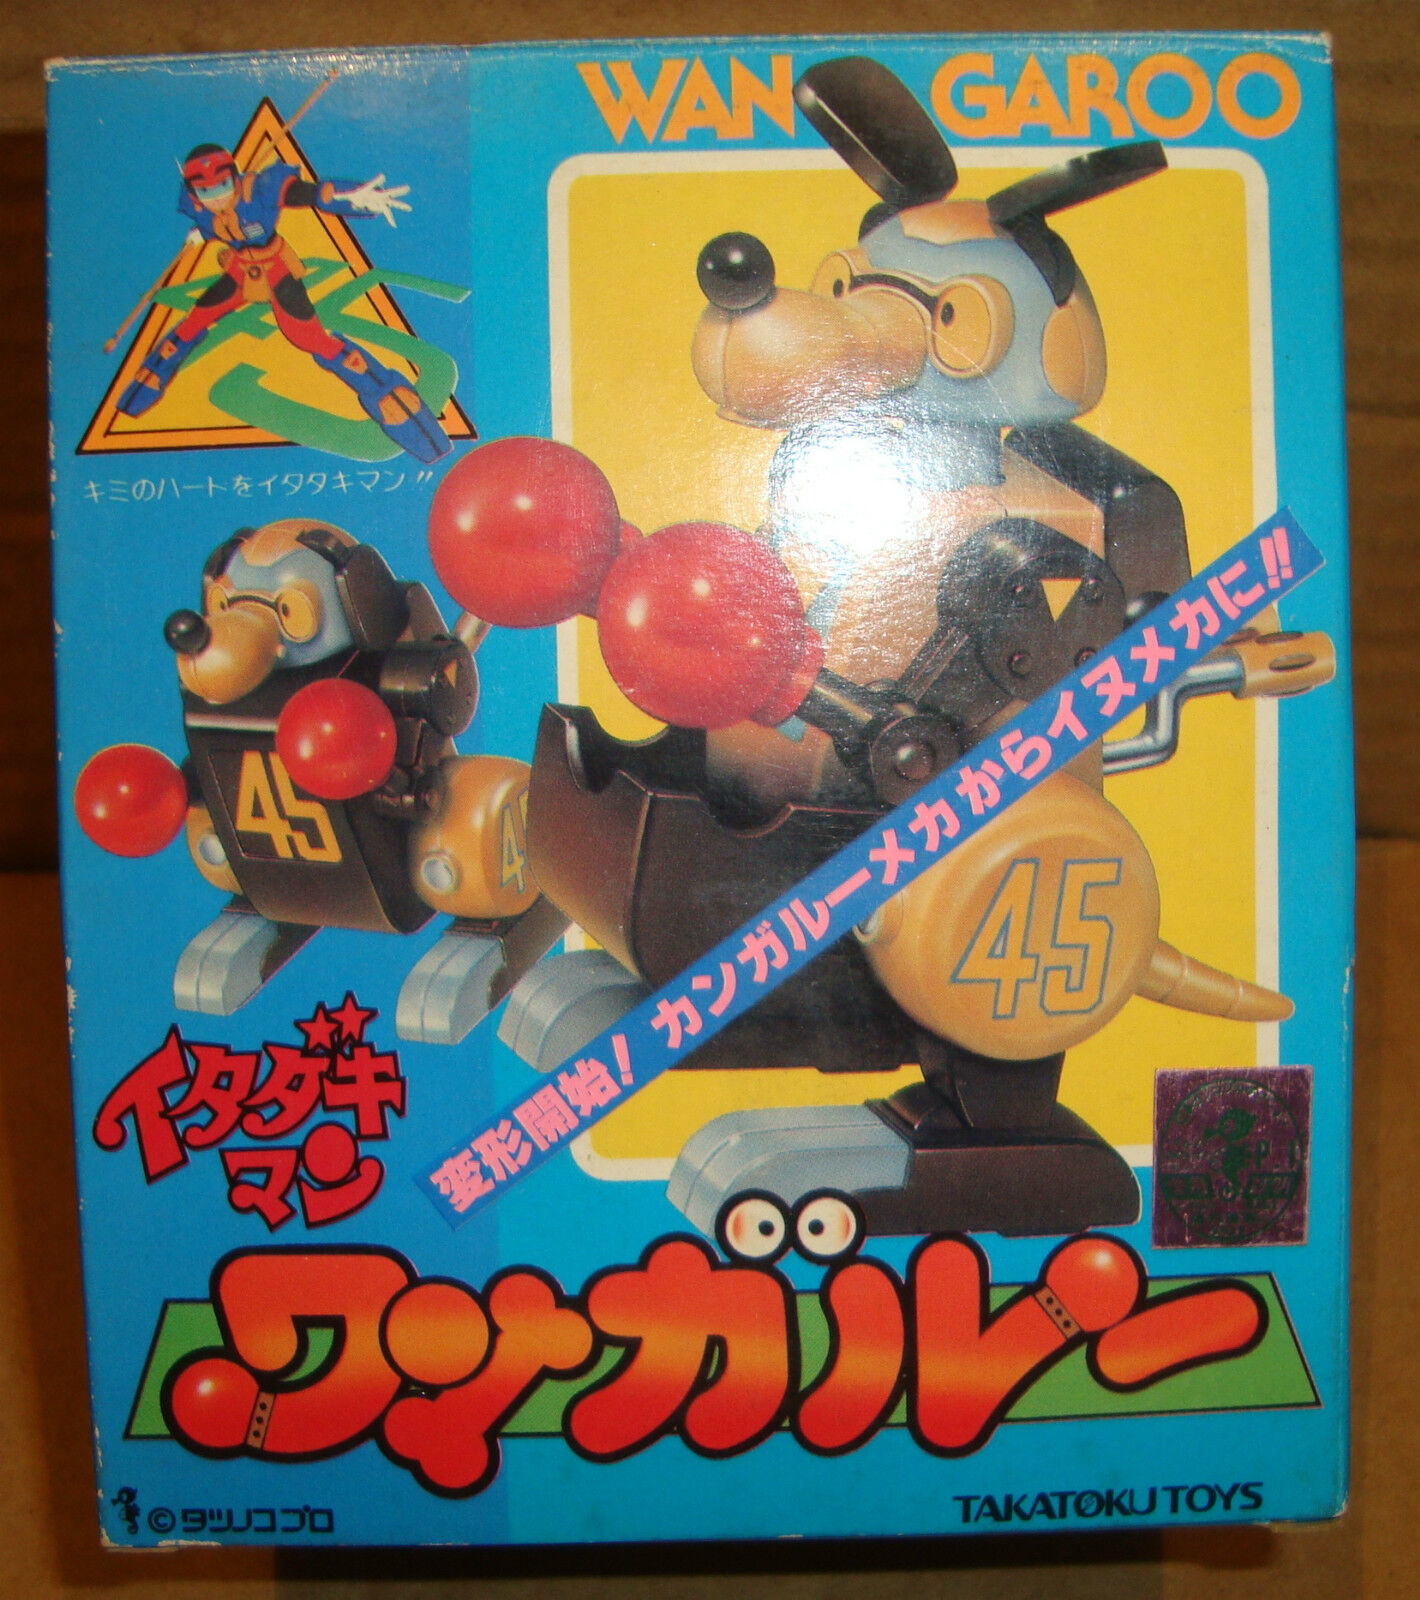 ITADAKIMAN WANGAROO - TAKATOKU TOYS  POPY-BANDAI-TATSUNOKO-oroRAKE-CHOGOKIN